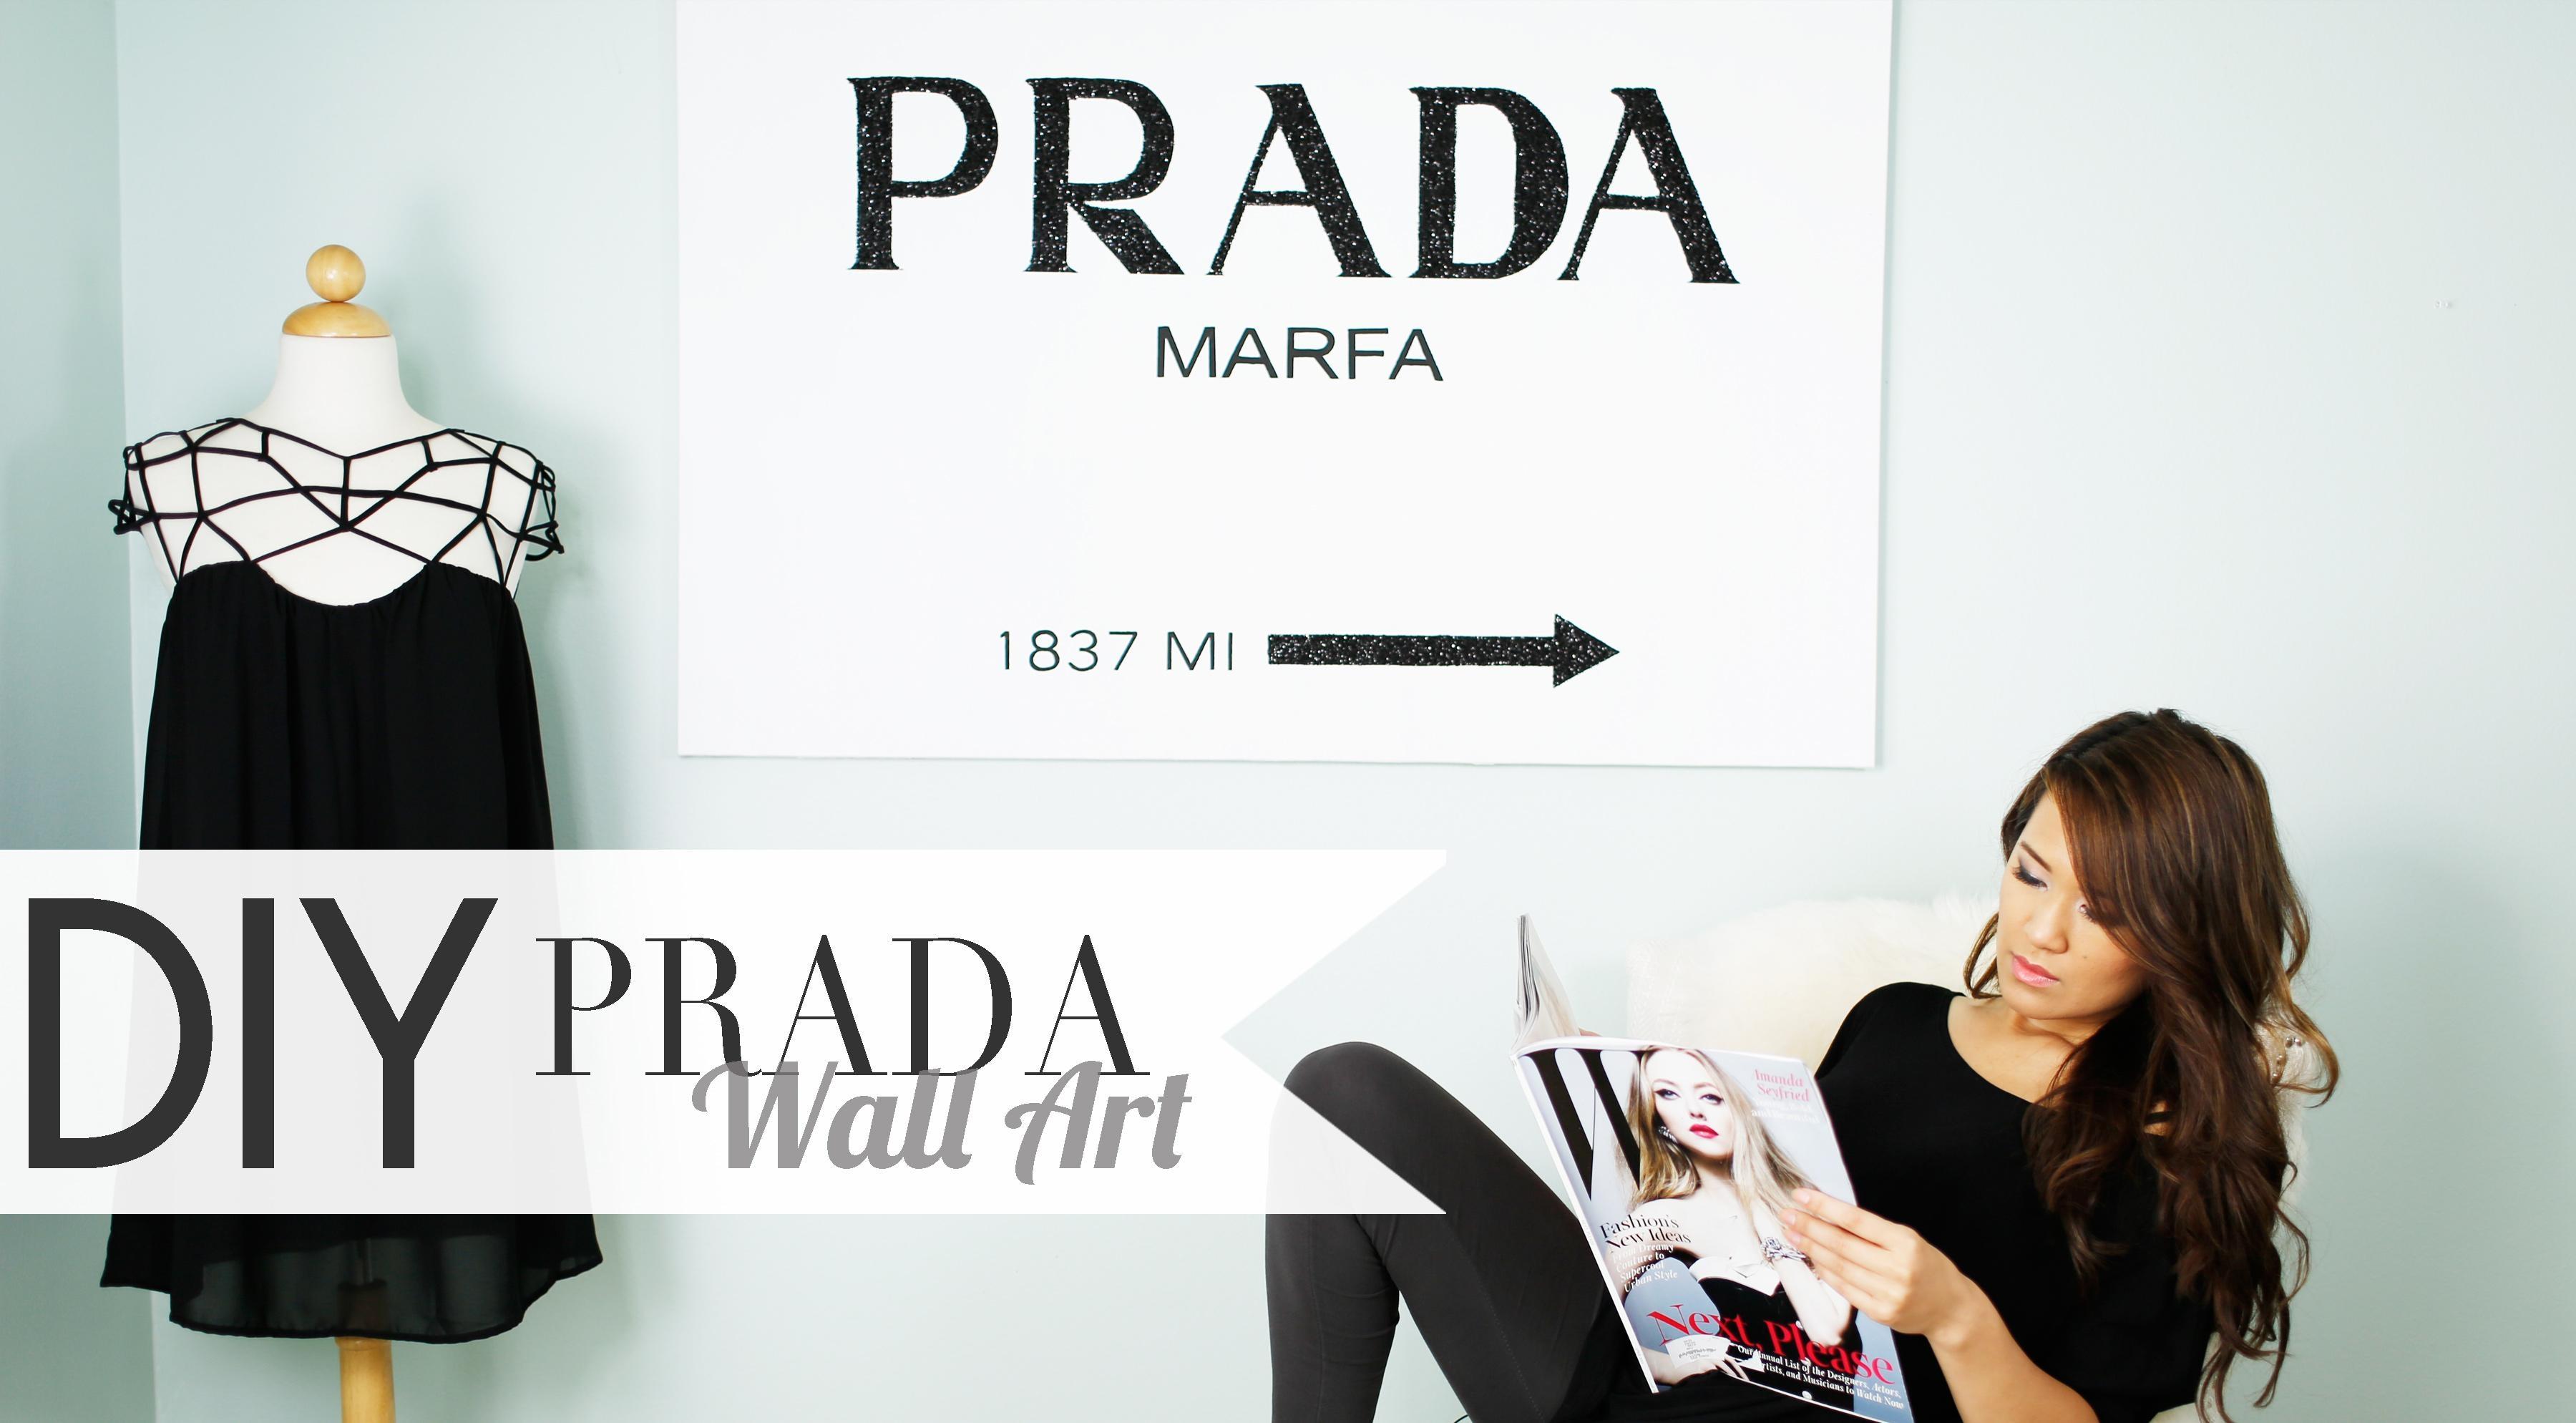 Gossip Girl Prada Wall Art – Ann Le Style Inside Prada Marfa Wall Art (Image 5 of 20)